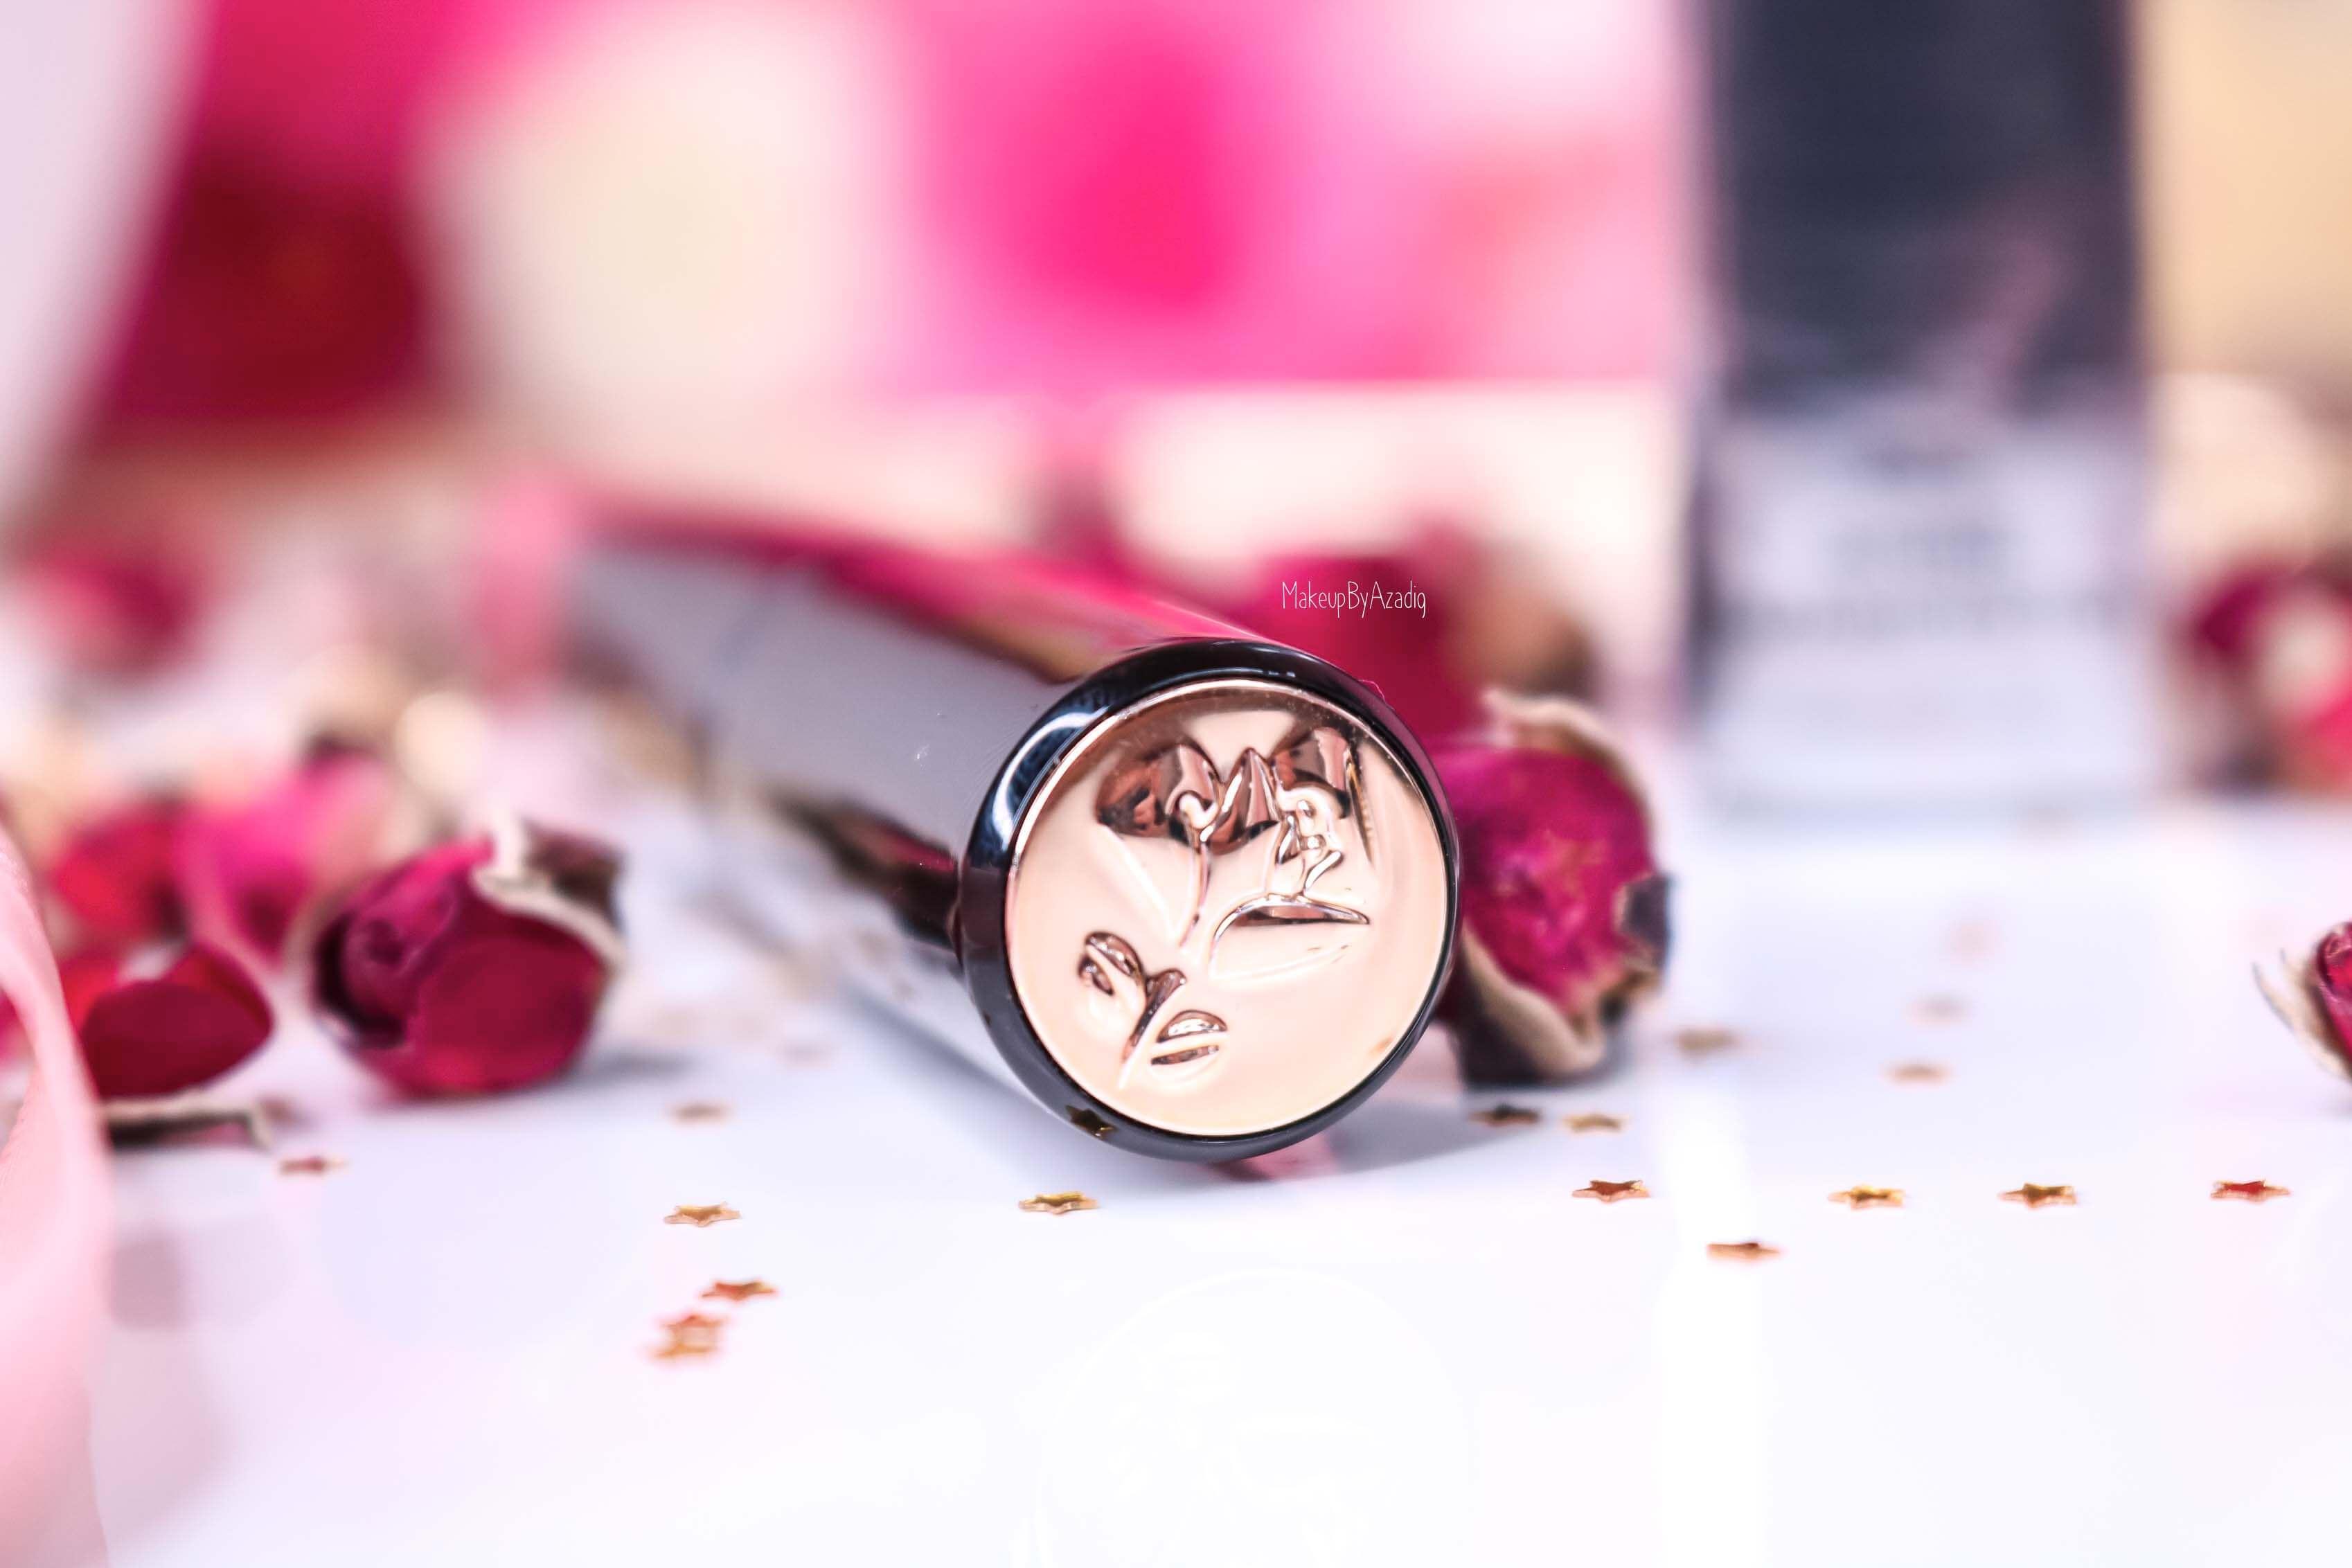 revue-lacque-a-levres-absolu-lacquer-lancome-shine-manifesto-323-sephora-avis-prix-tenue-makeupbyazadig-swatch-logo